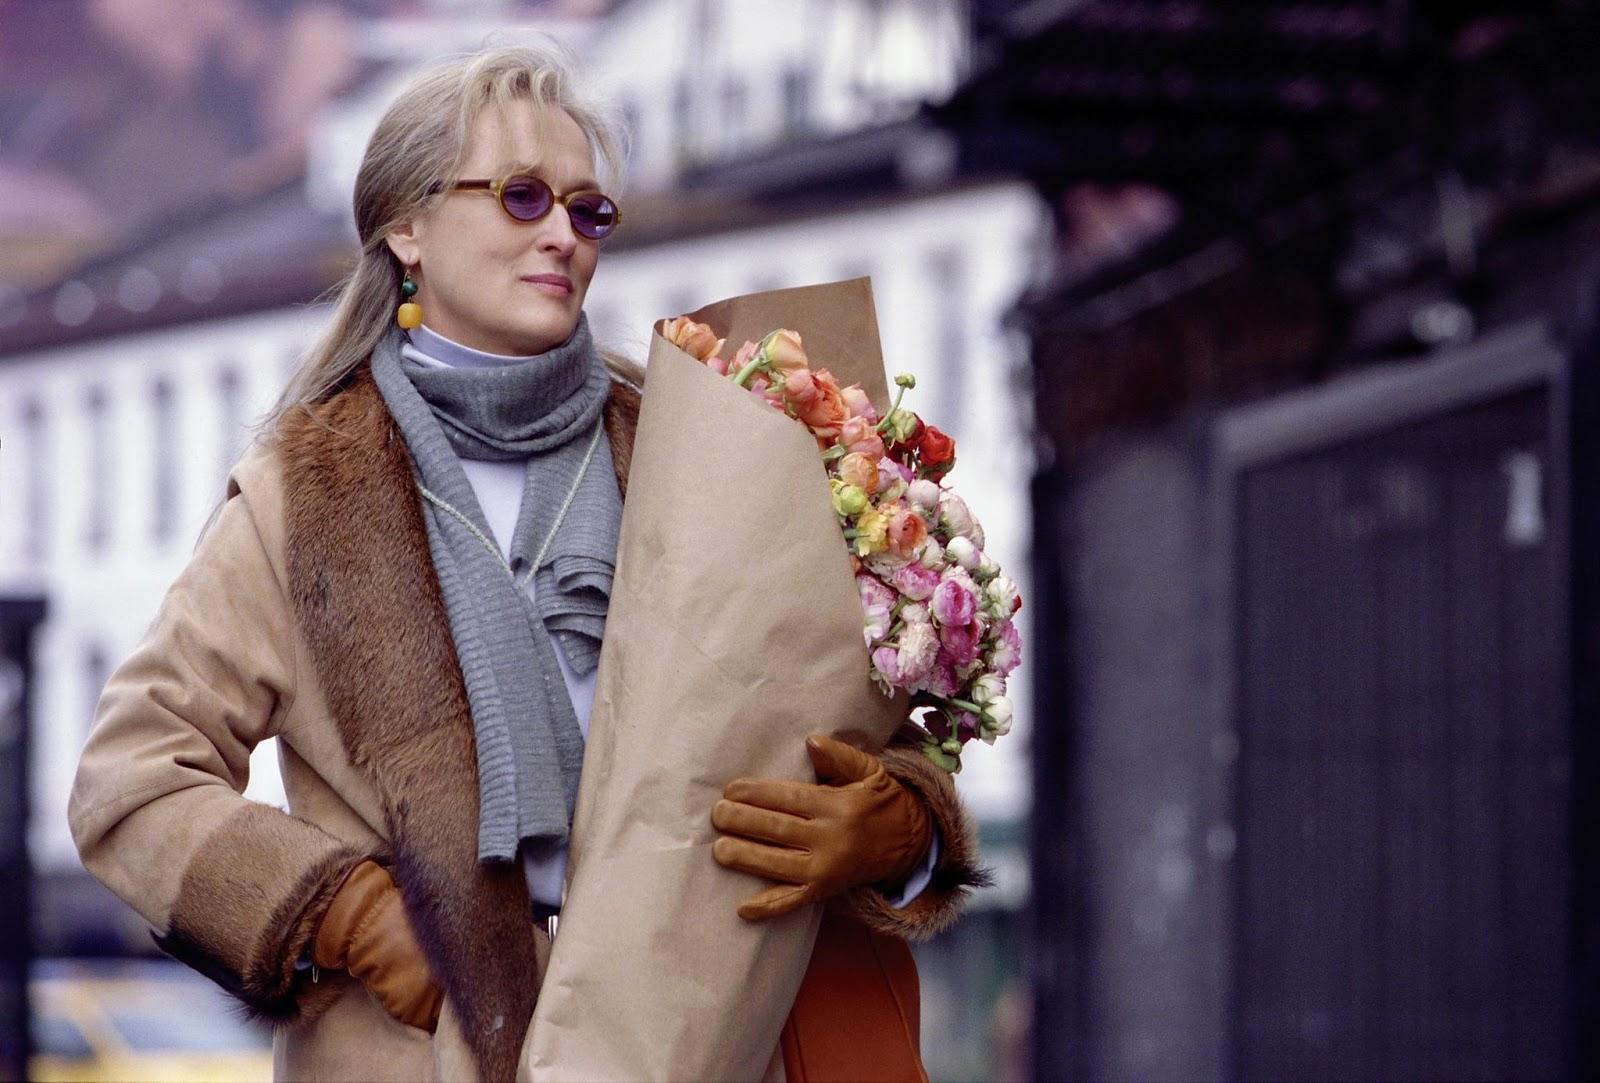 Clarissa Flowers